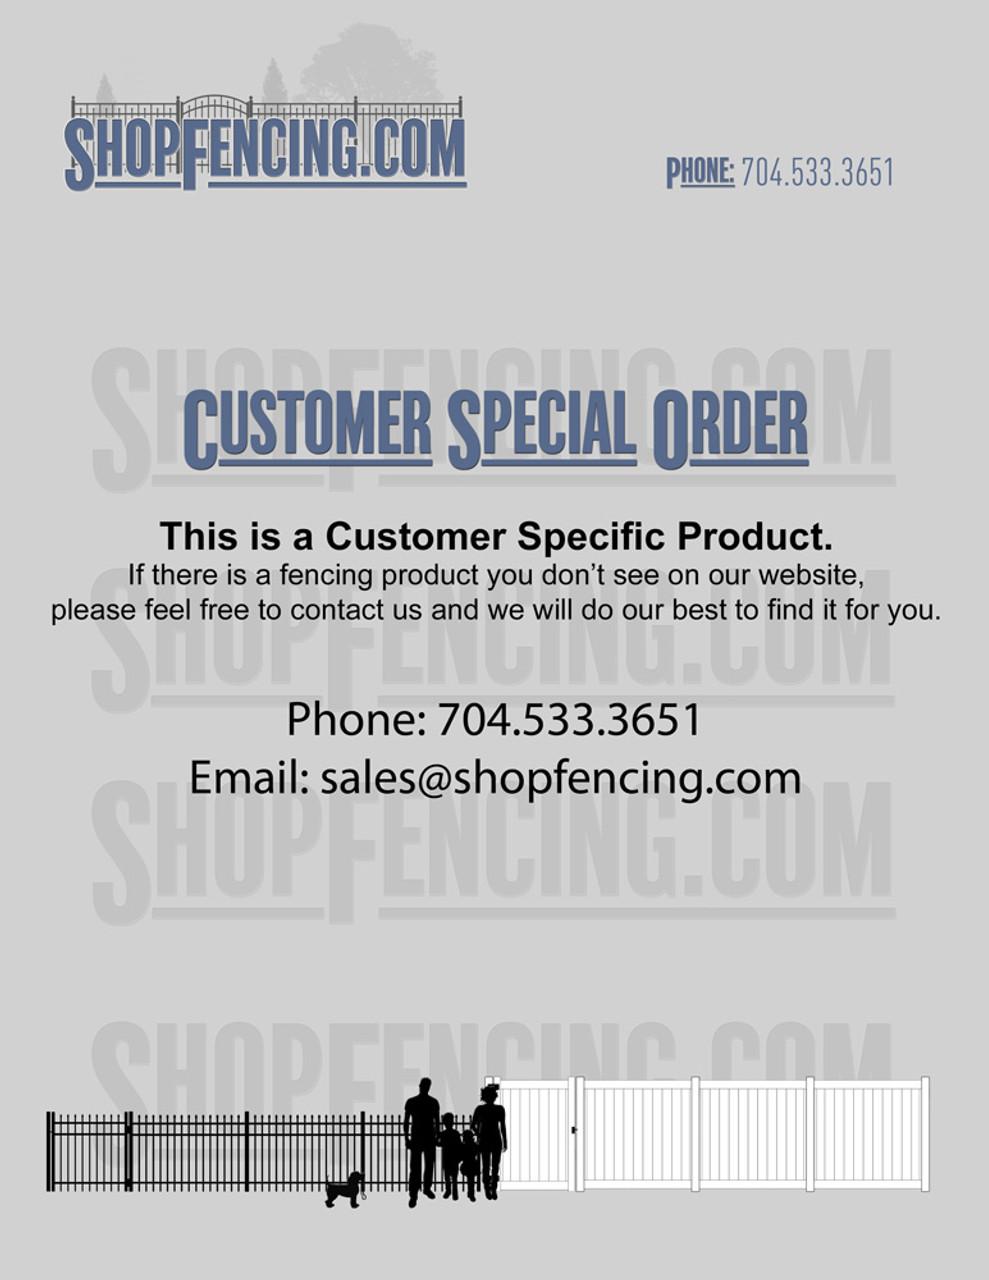 ShopFencing.com Customer Special Order